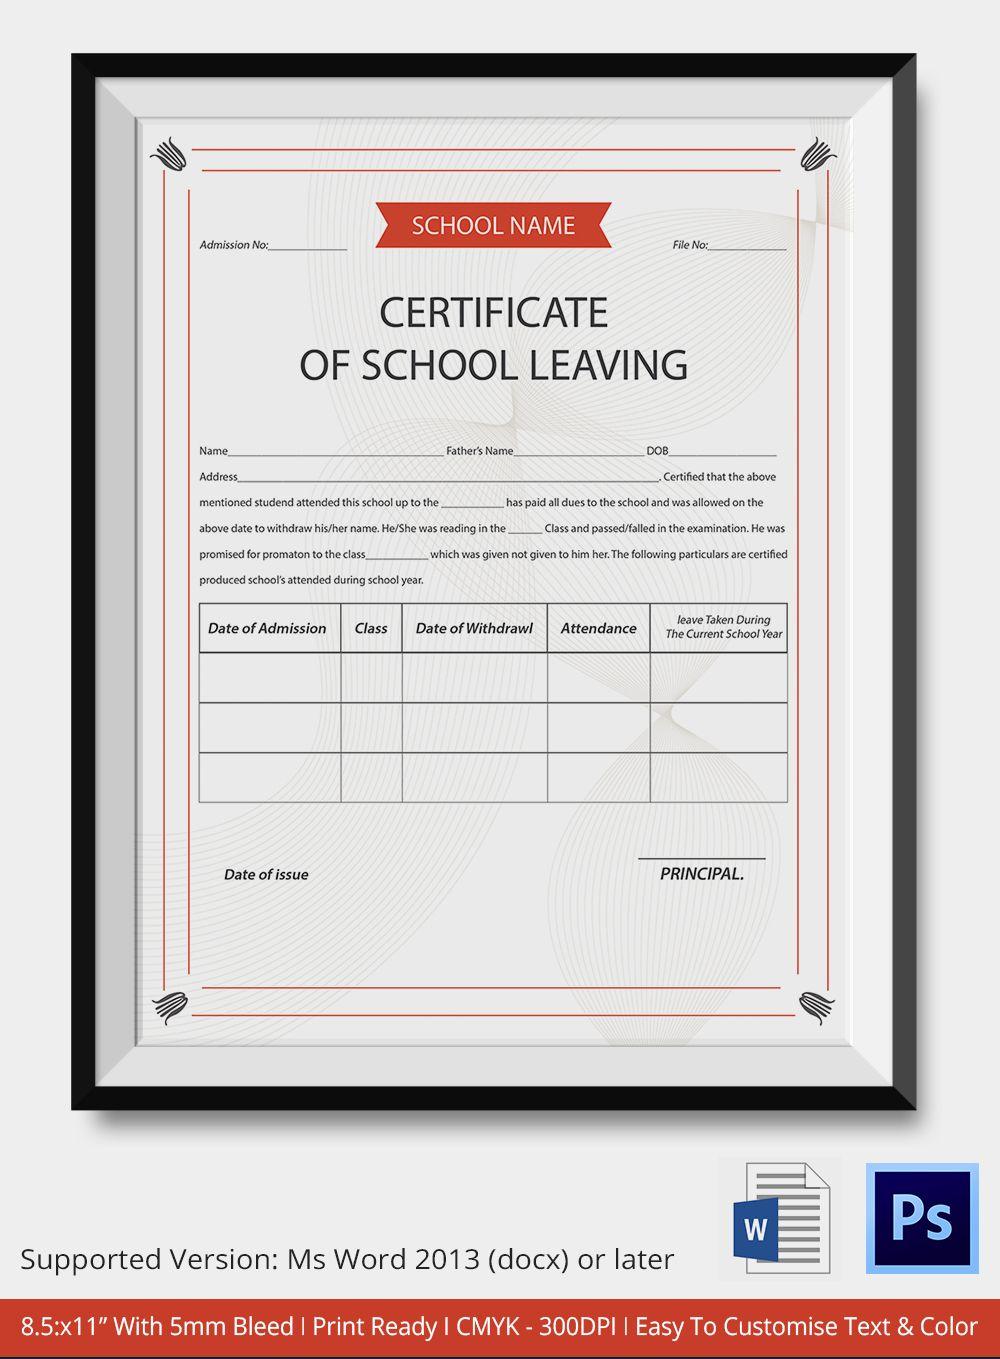 School Leaving Certificate Template | Certificate Templates Regarding School Leaving Certificate Template